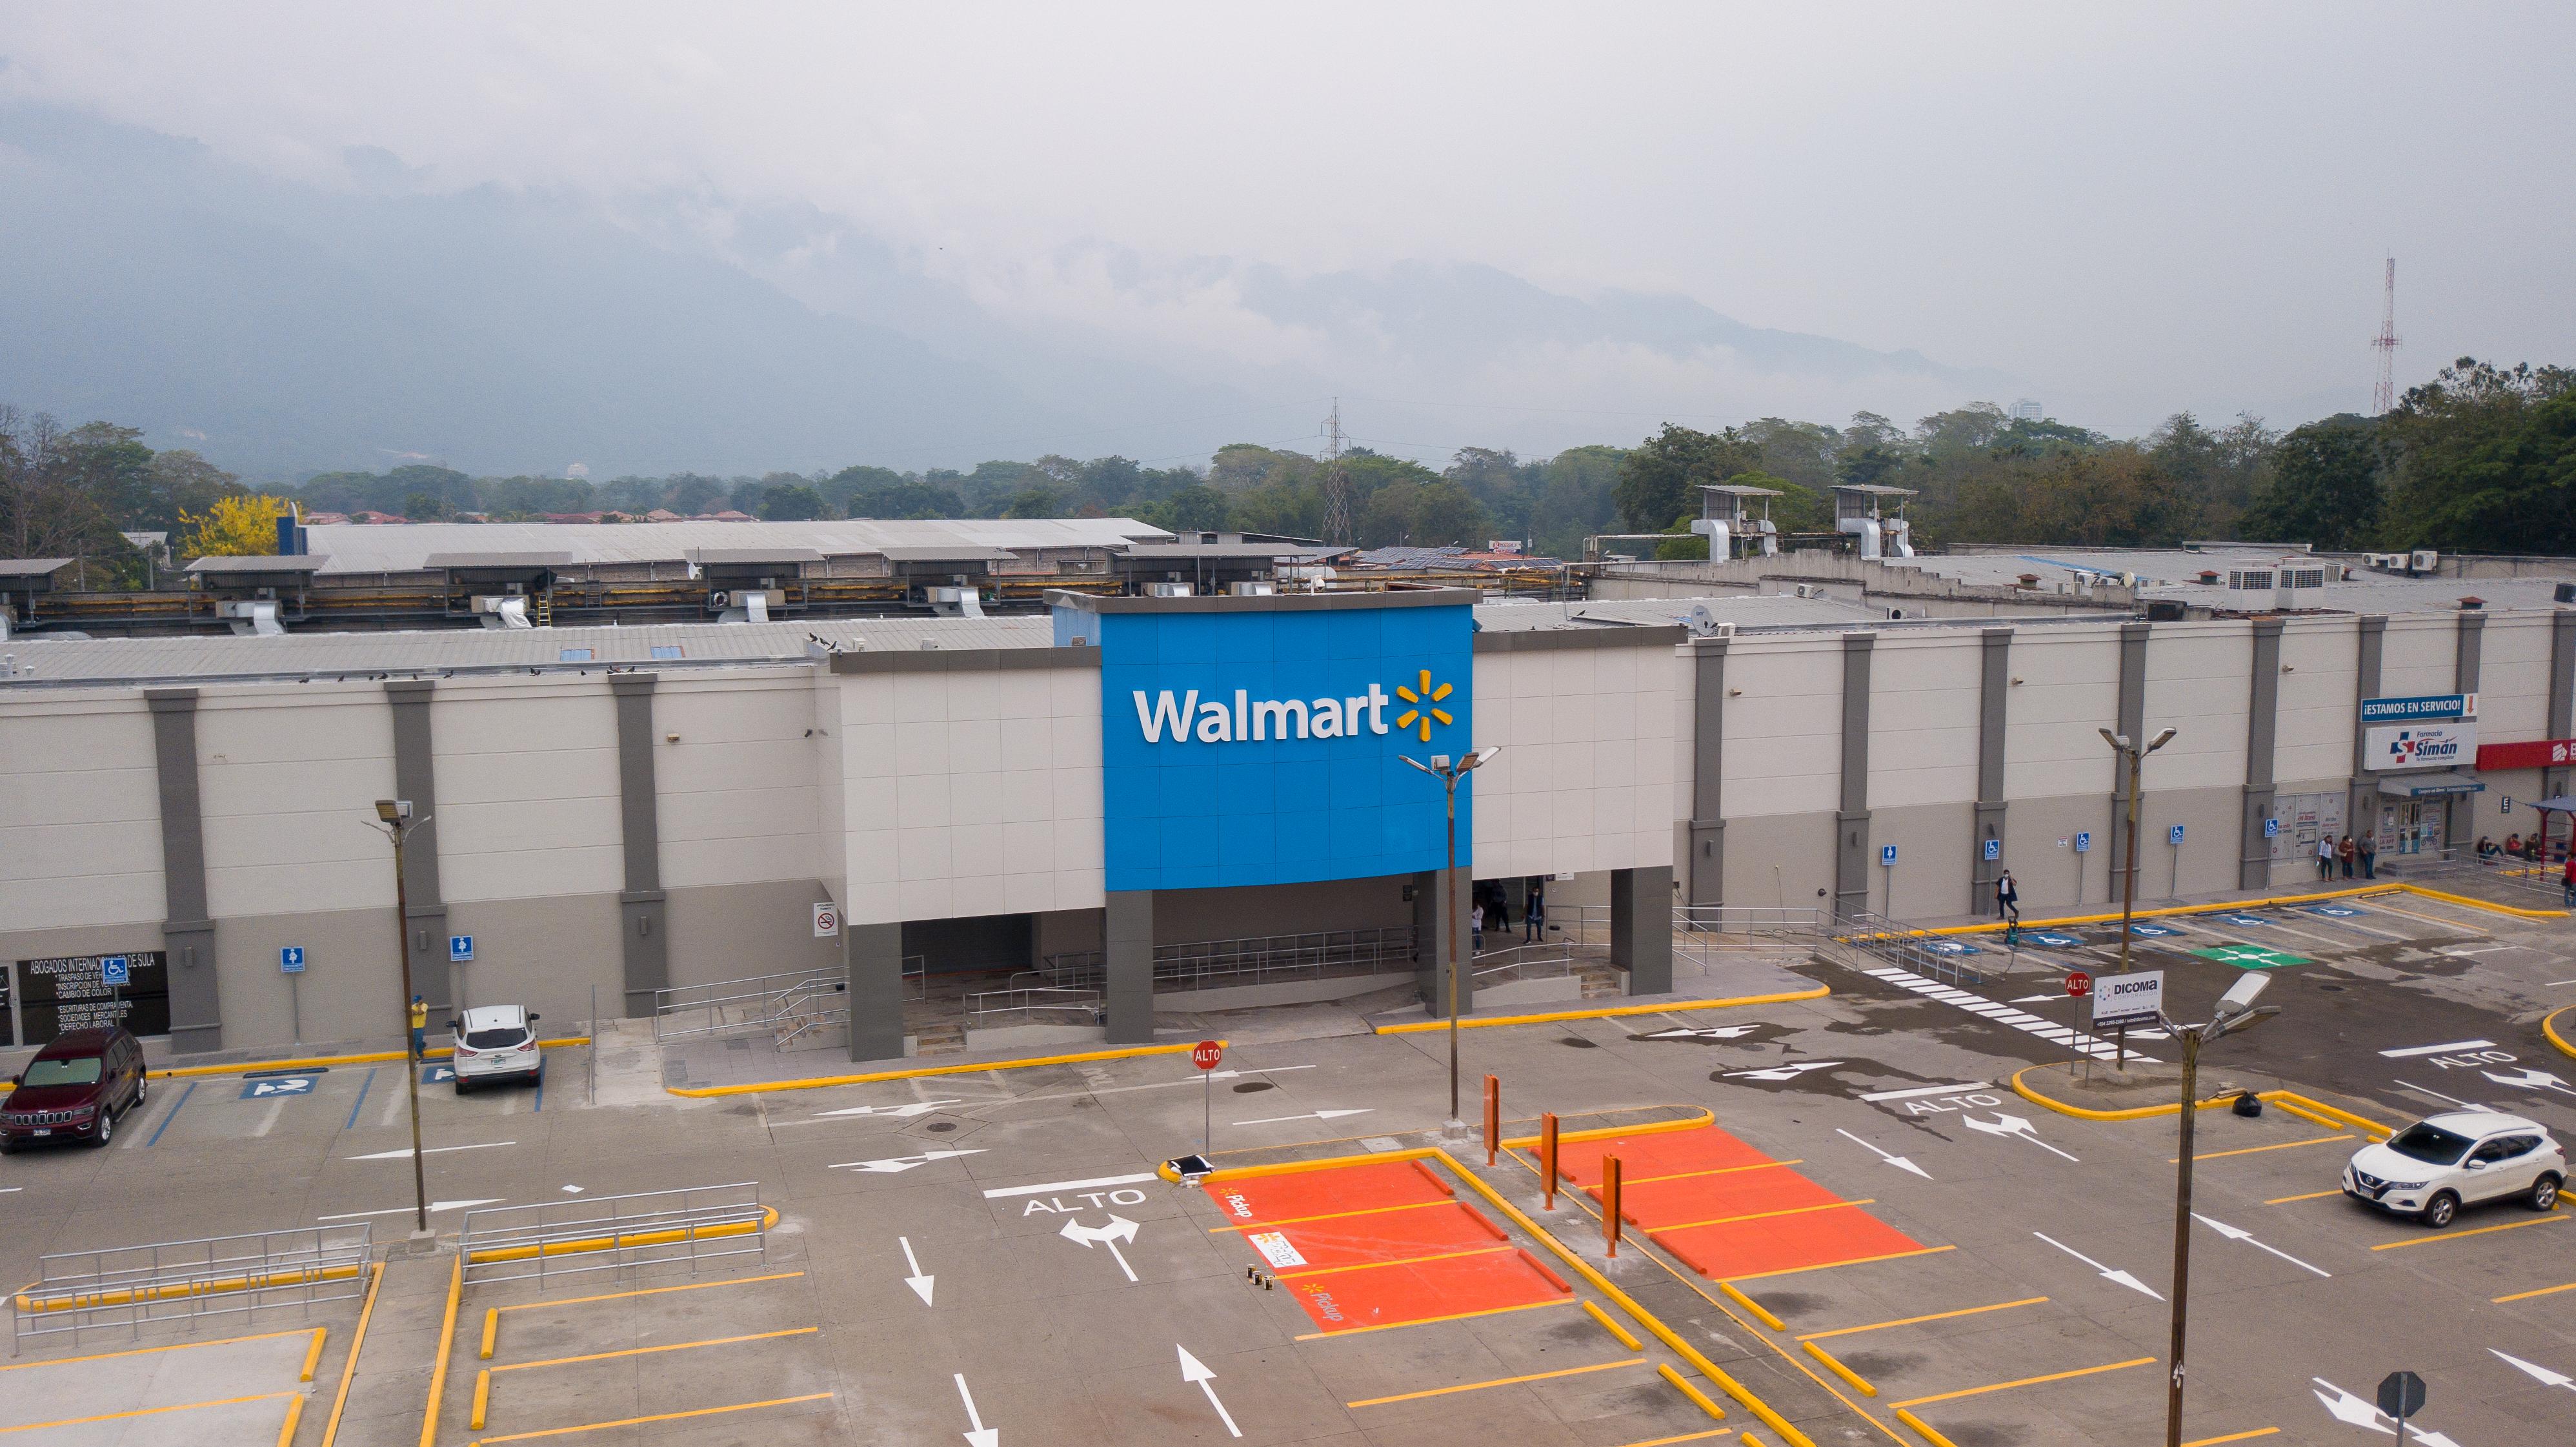 Walmart Bulevar Norte San Pedro Sula Honduras 1